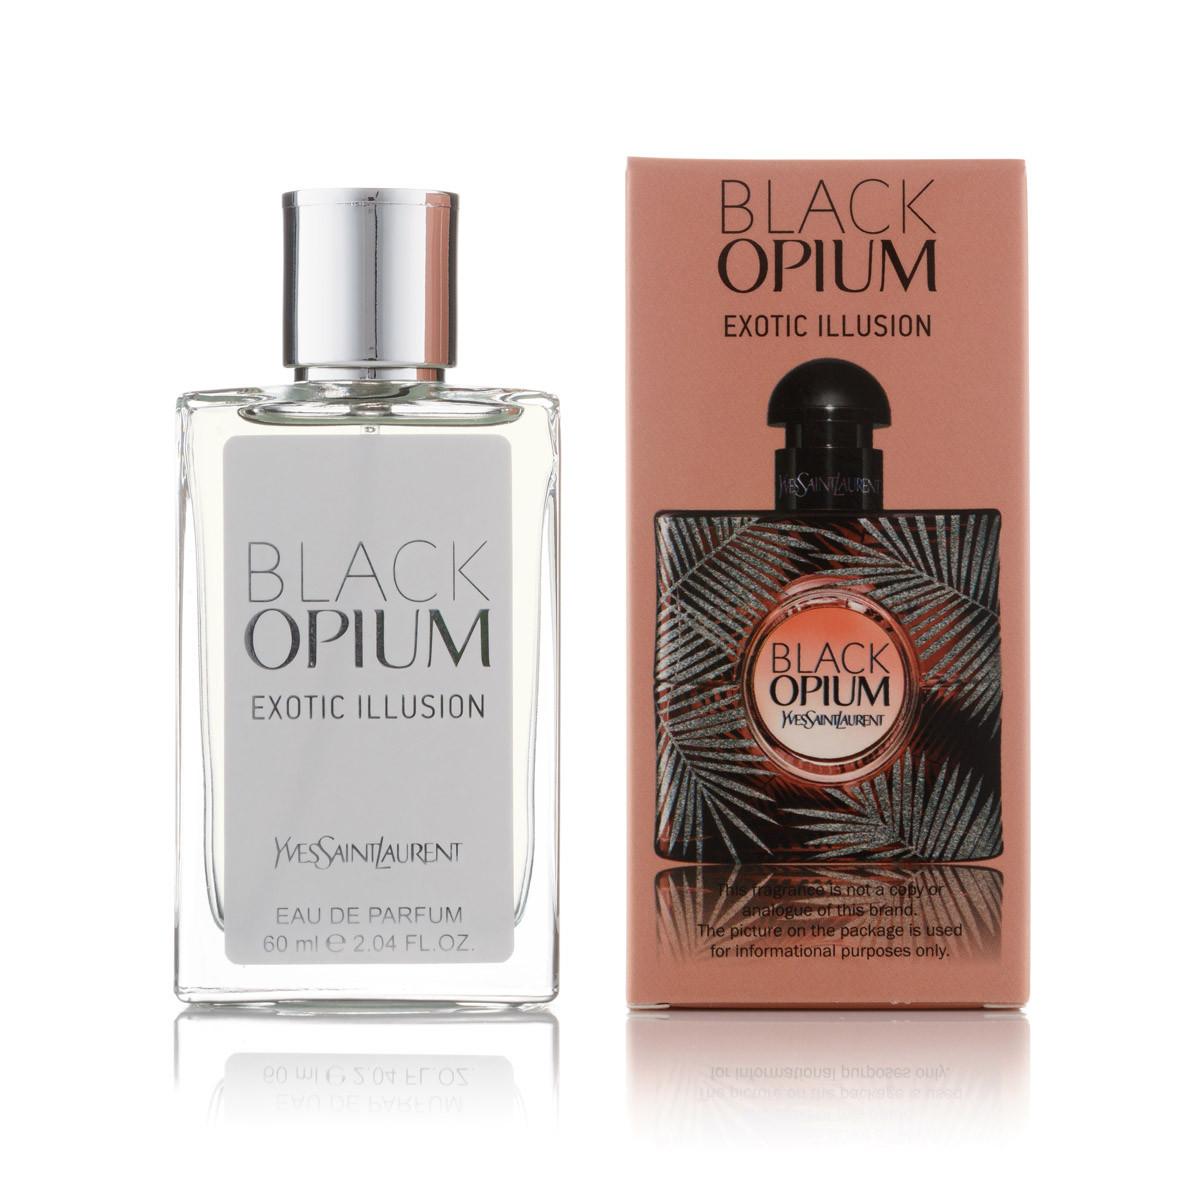 Женский мини парфюм Yves Saint Laurent Black Opium Exotic Illusion - 60 мл